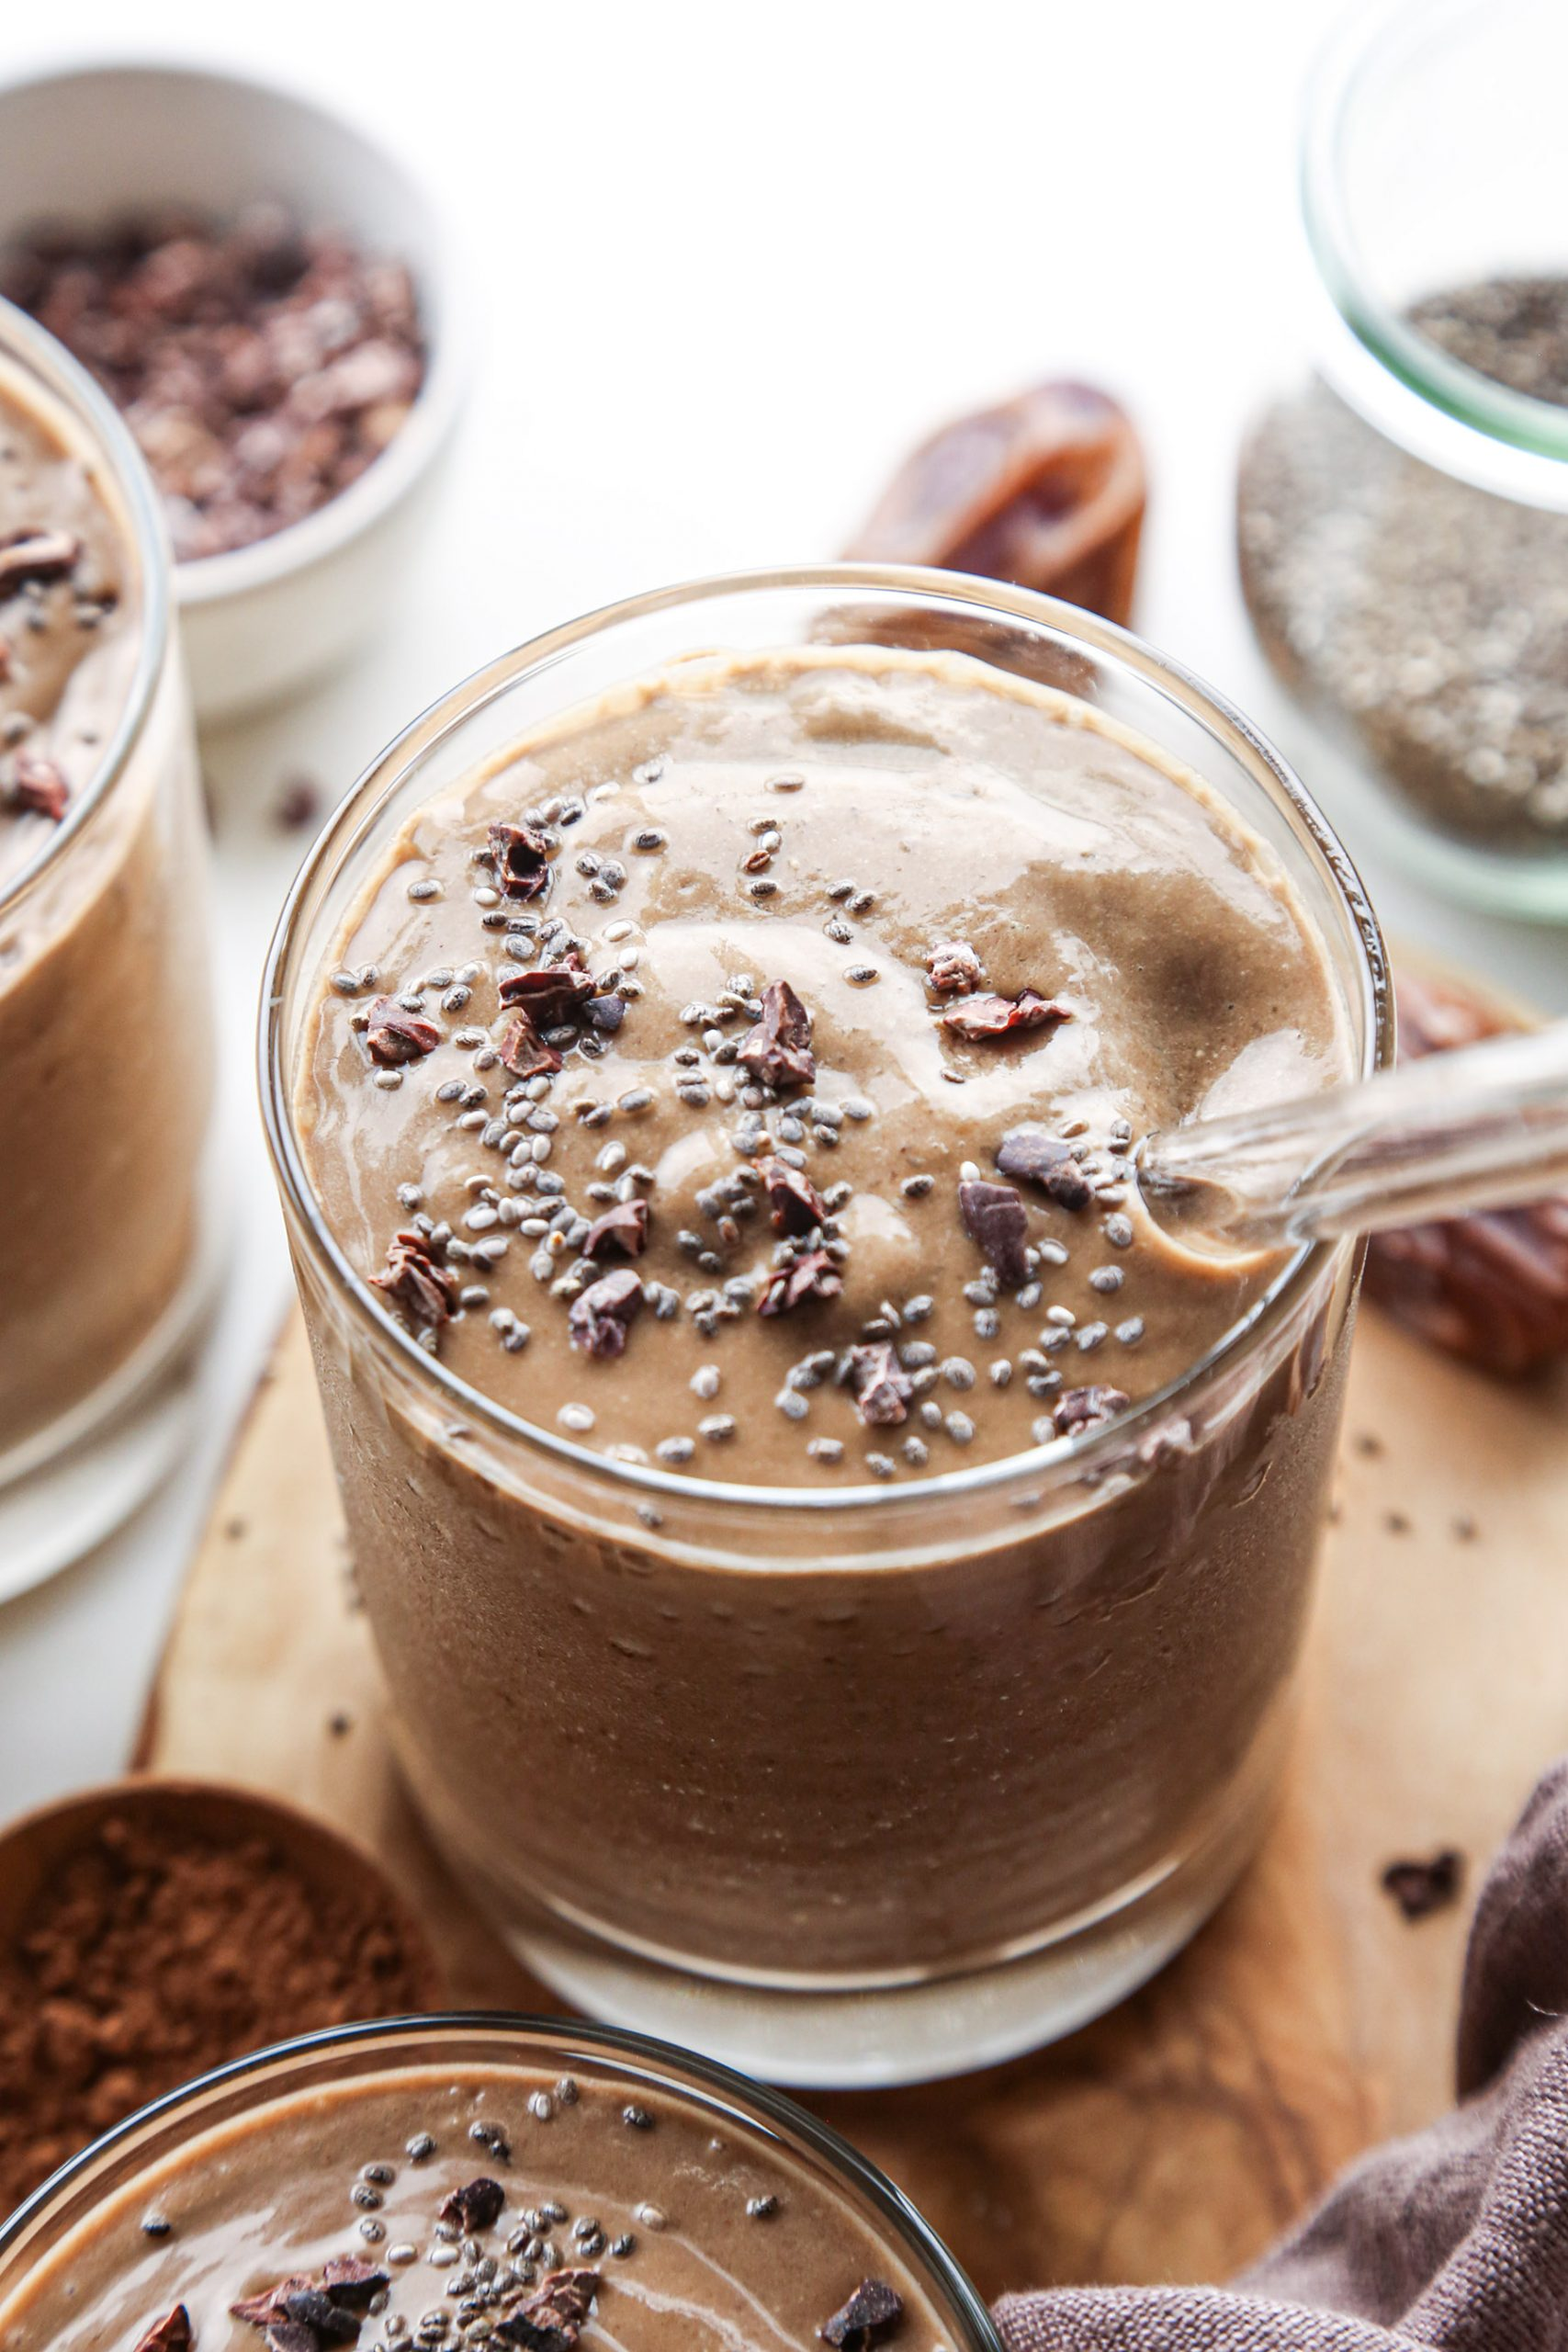 Chocolate Avocado Smoothie | Vegan and free of refined sugar